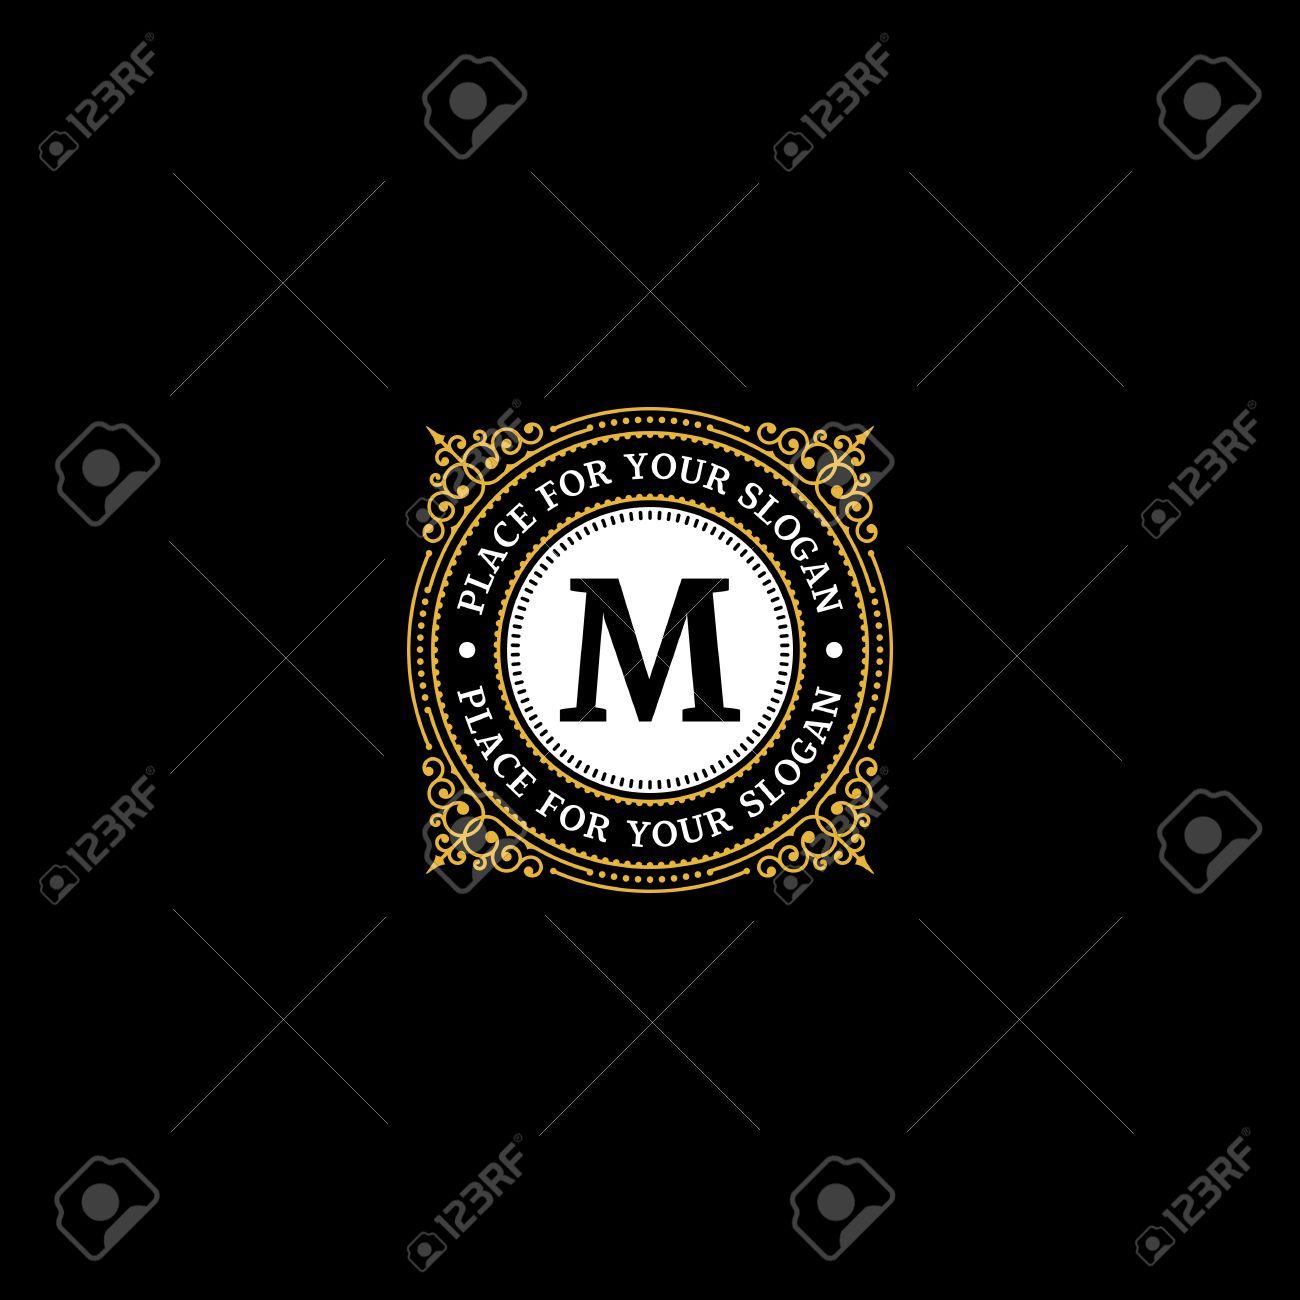 Tj initial luxury ornament monogram logo stock vector - M Monogram Simple Monogram Design Template With Letter M Elegant Frame Ornament Line Logo